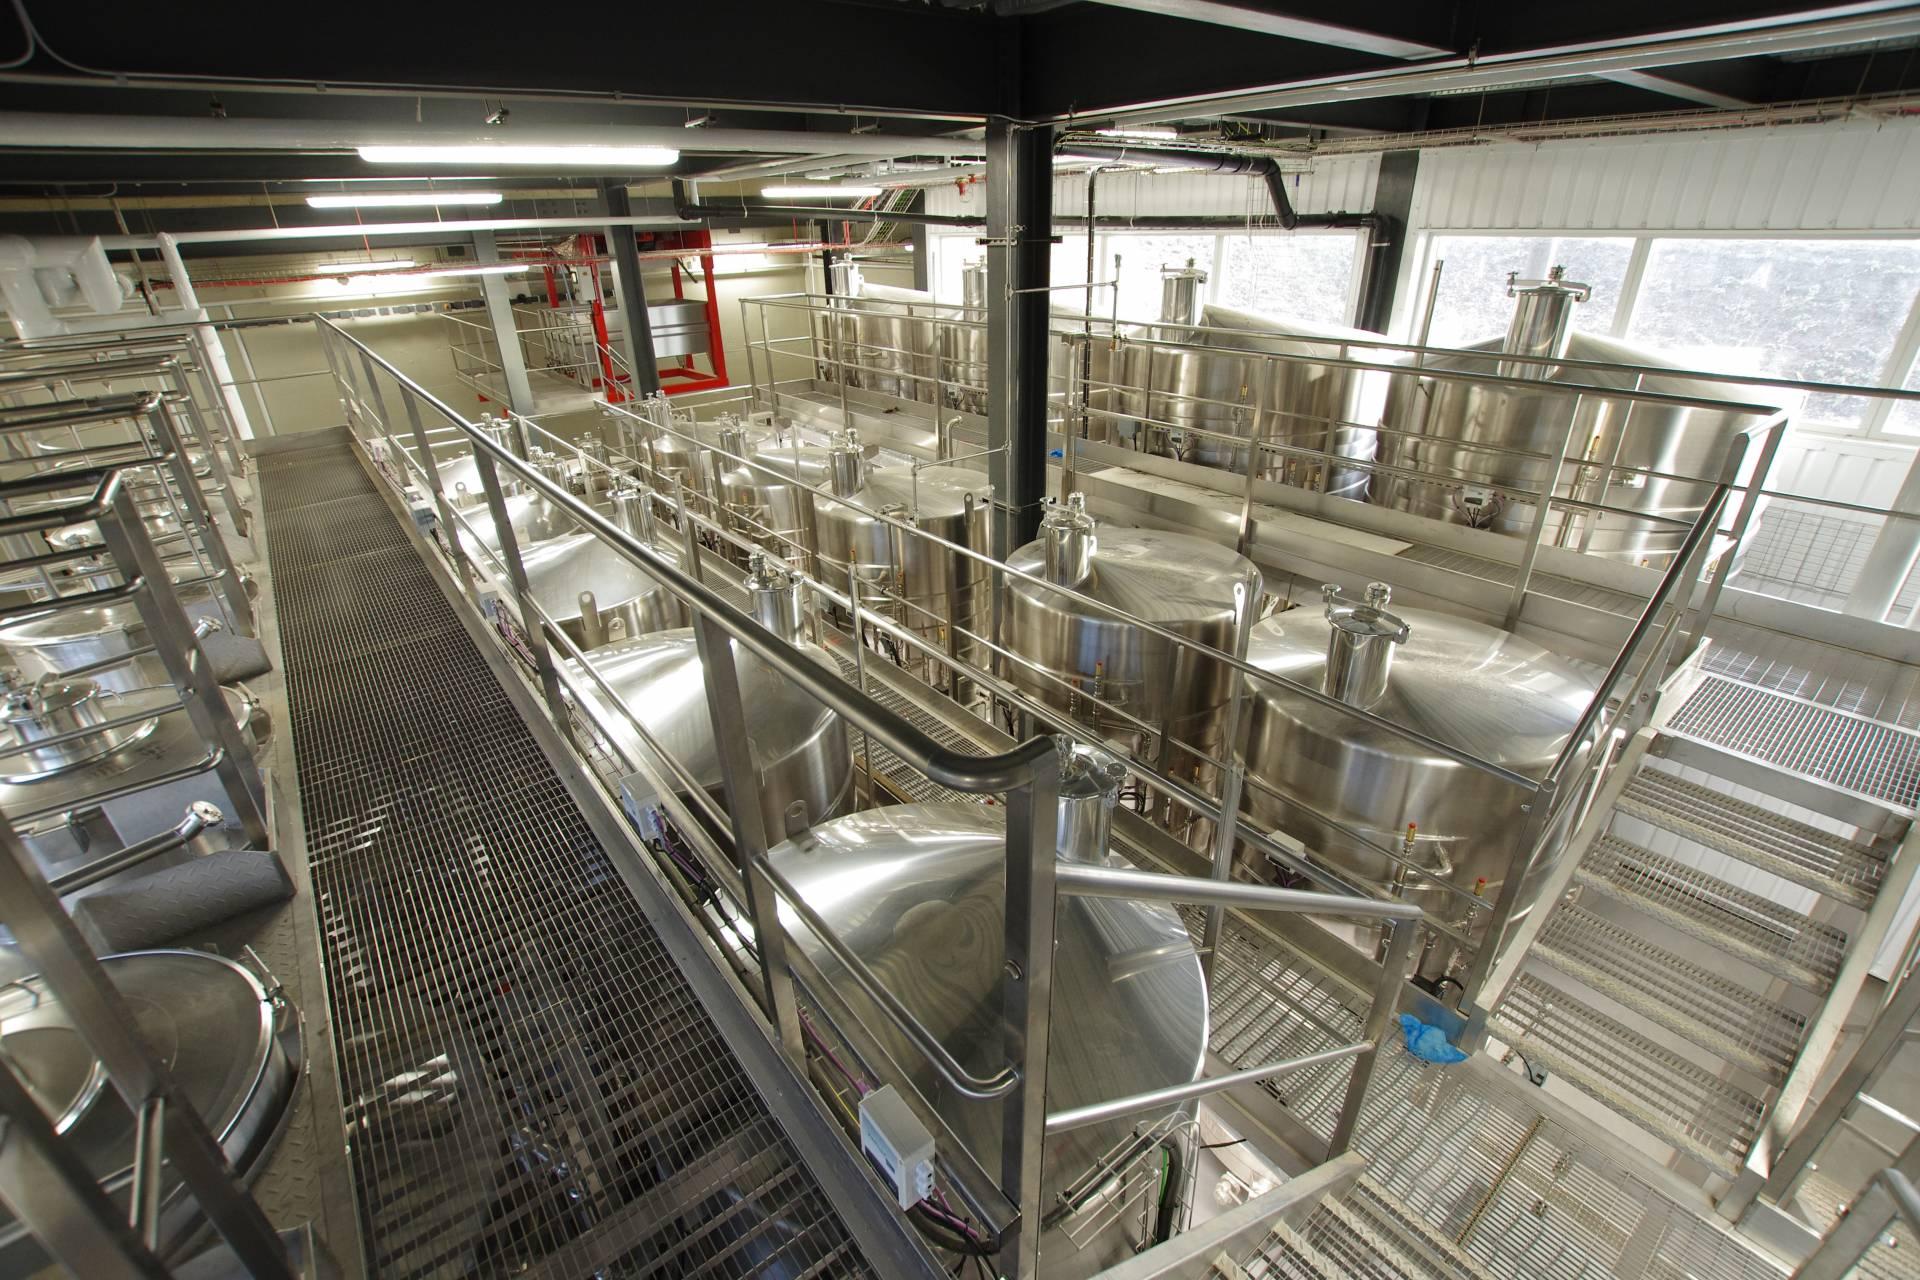 Rathfinny Winery wine storage facilities